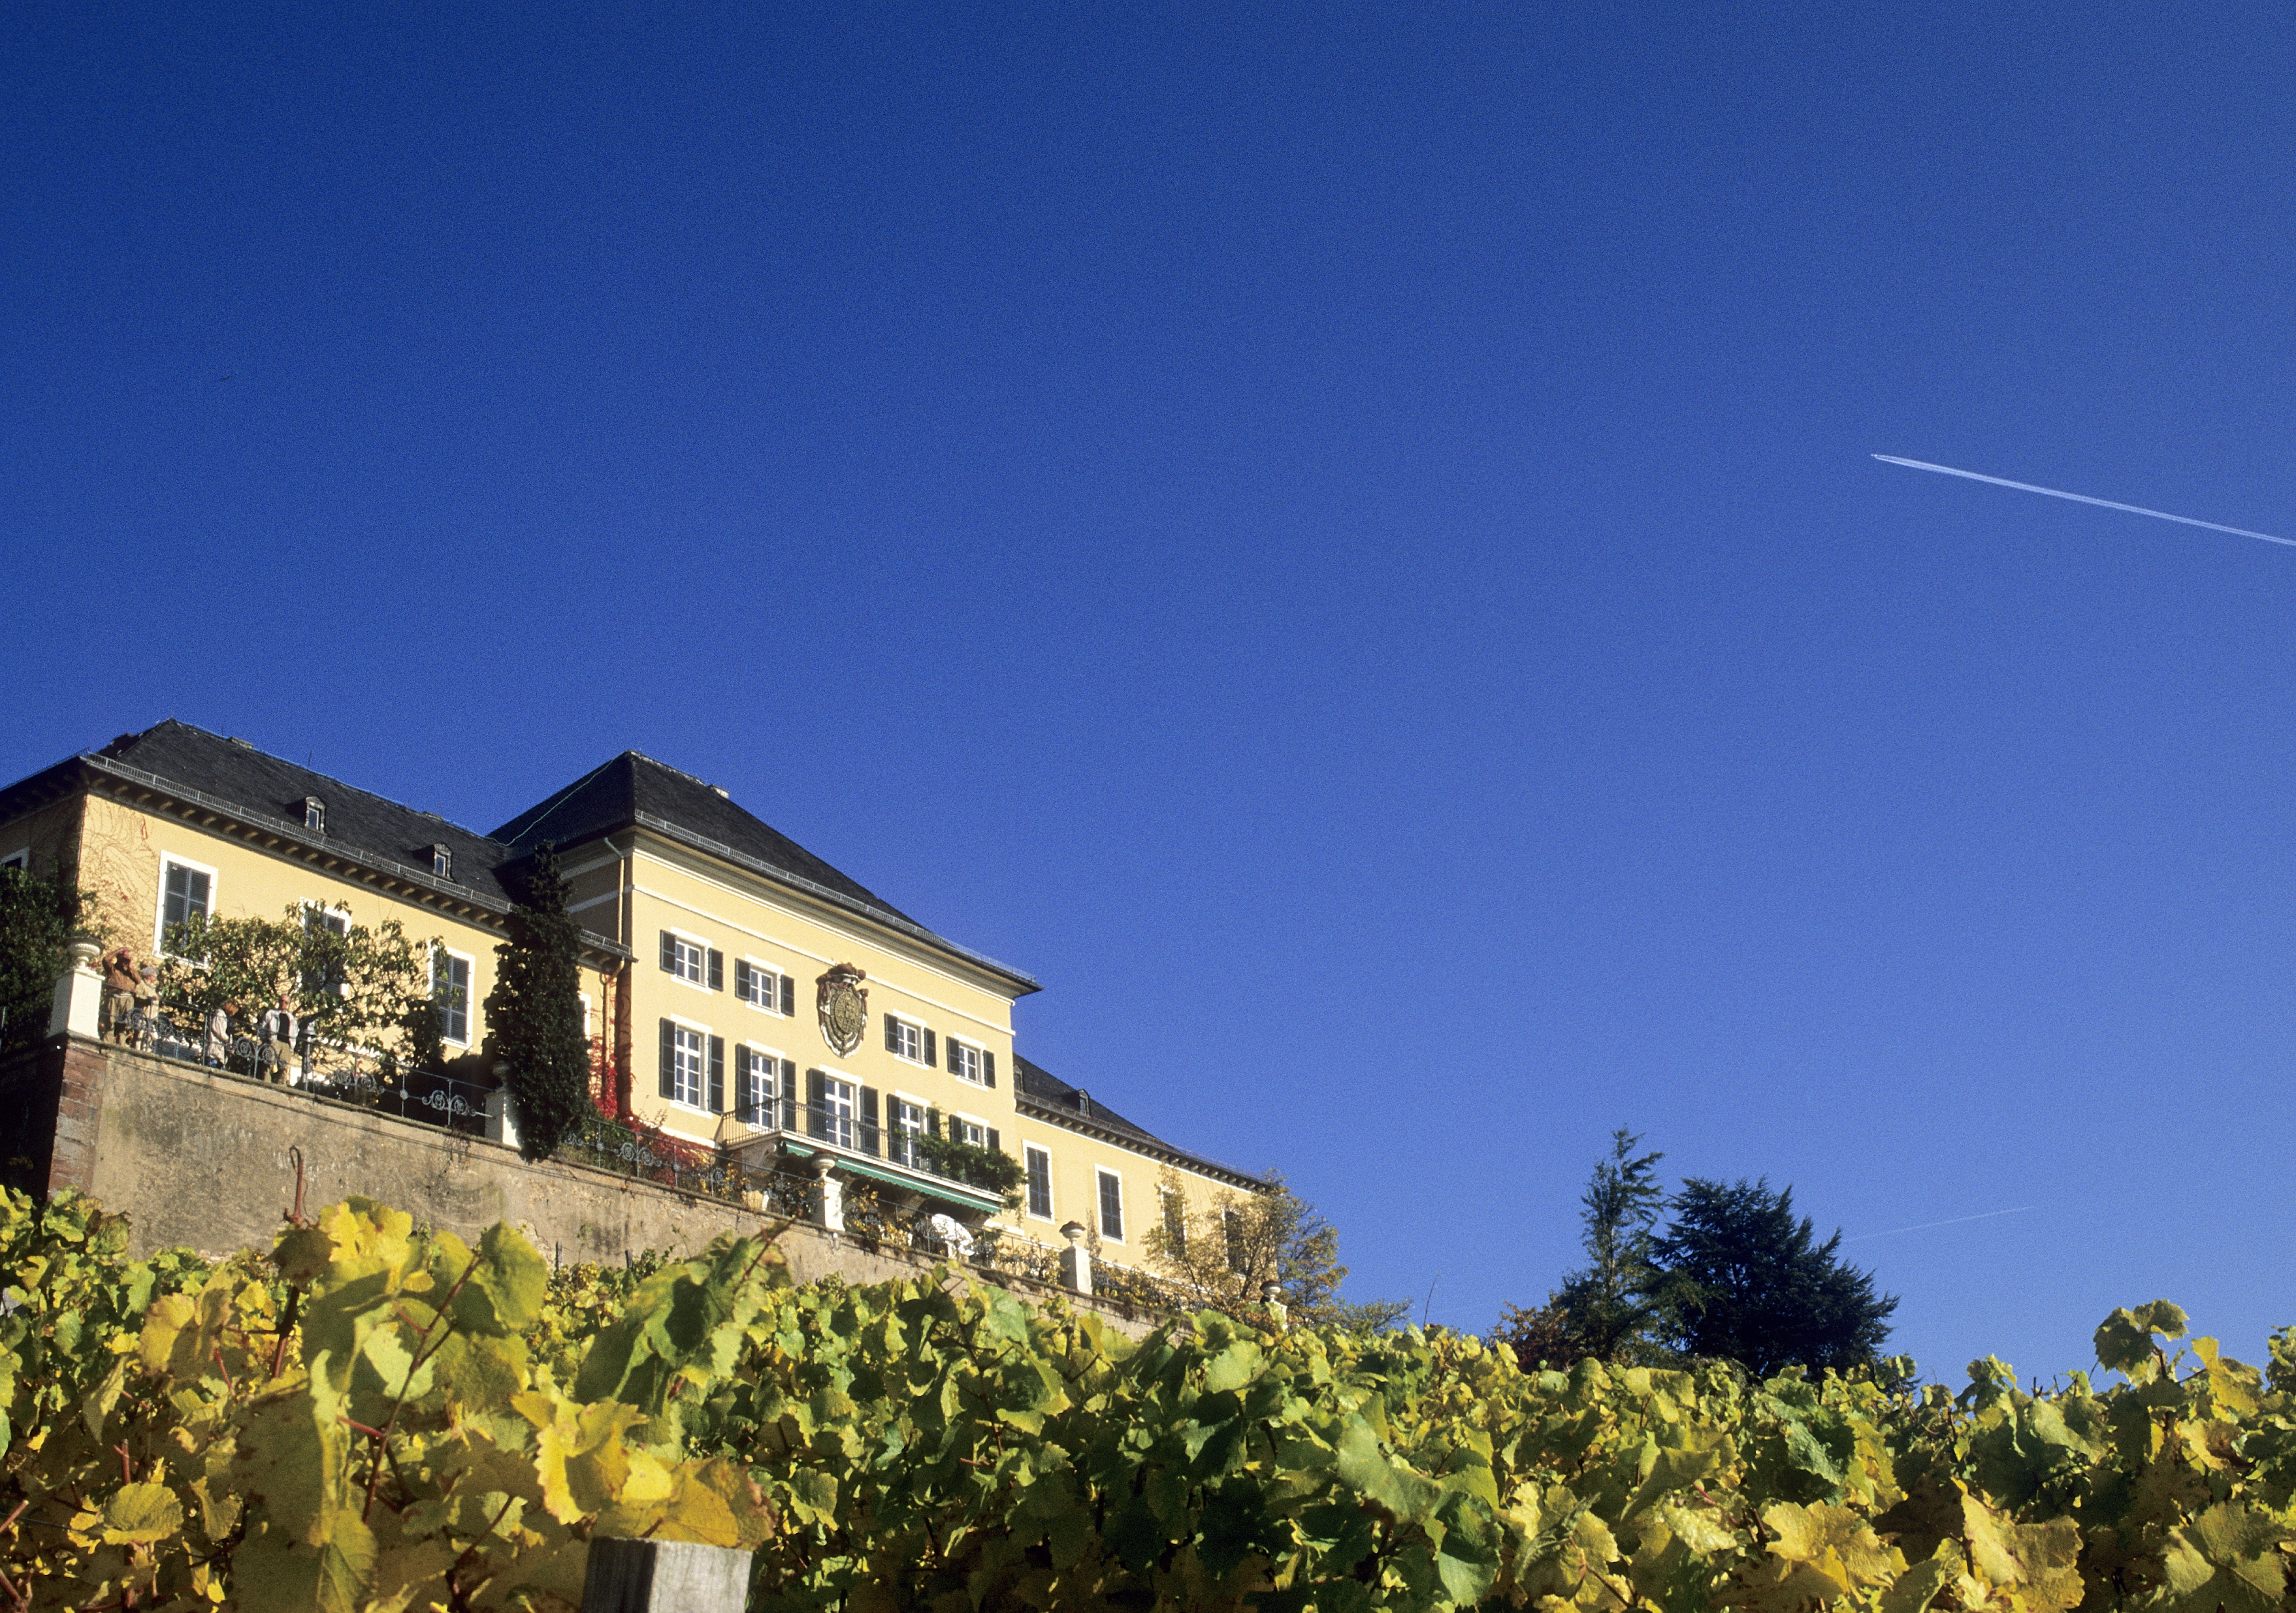 Johannisberg Castle